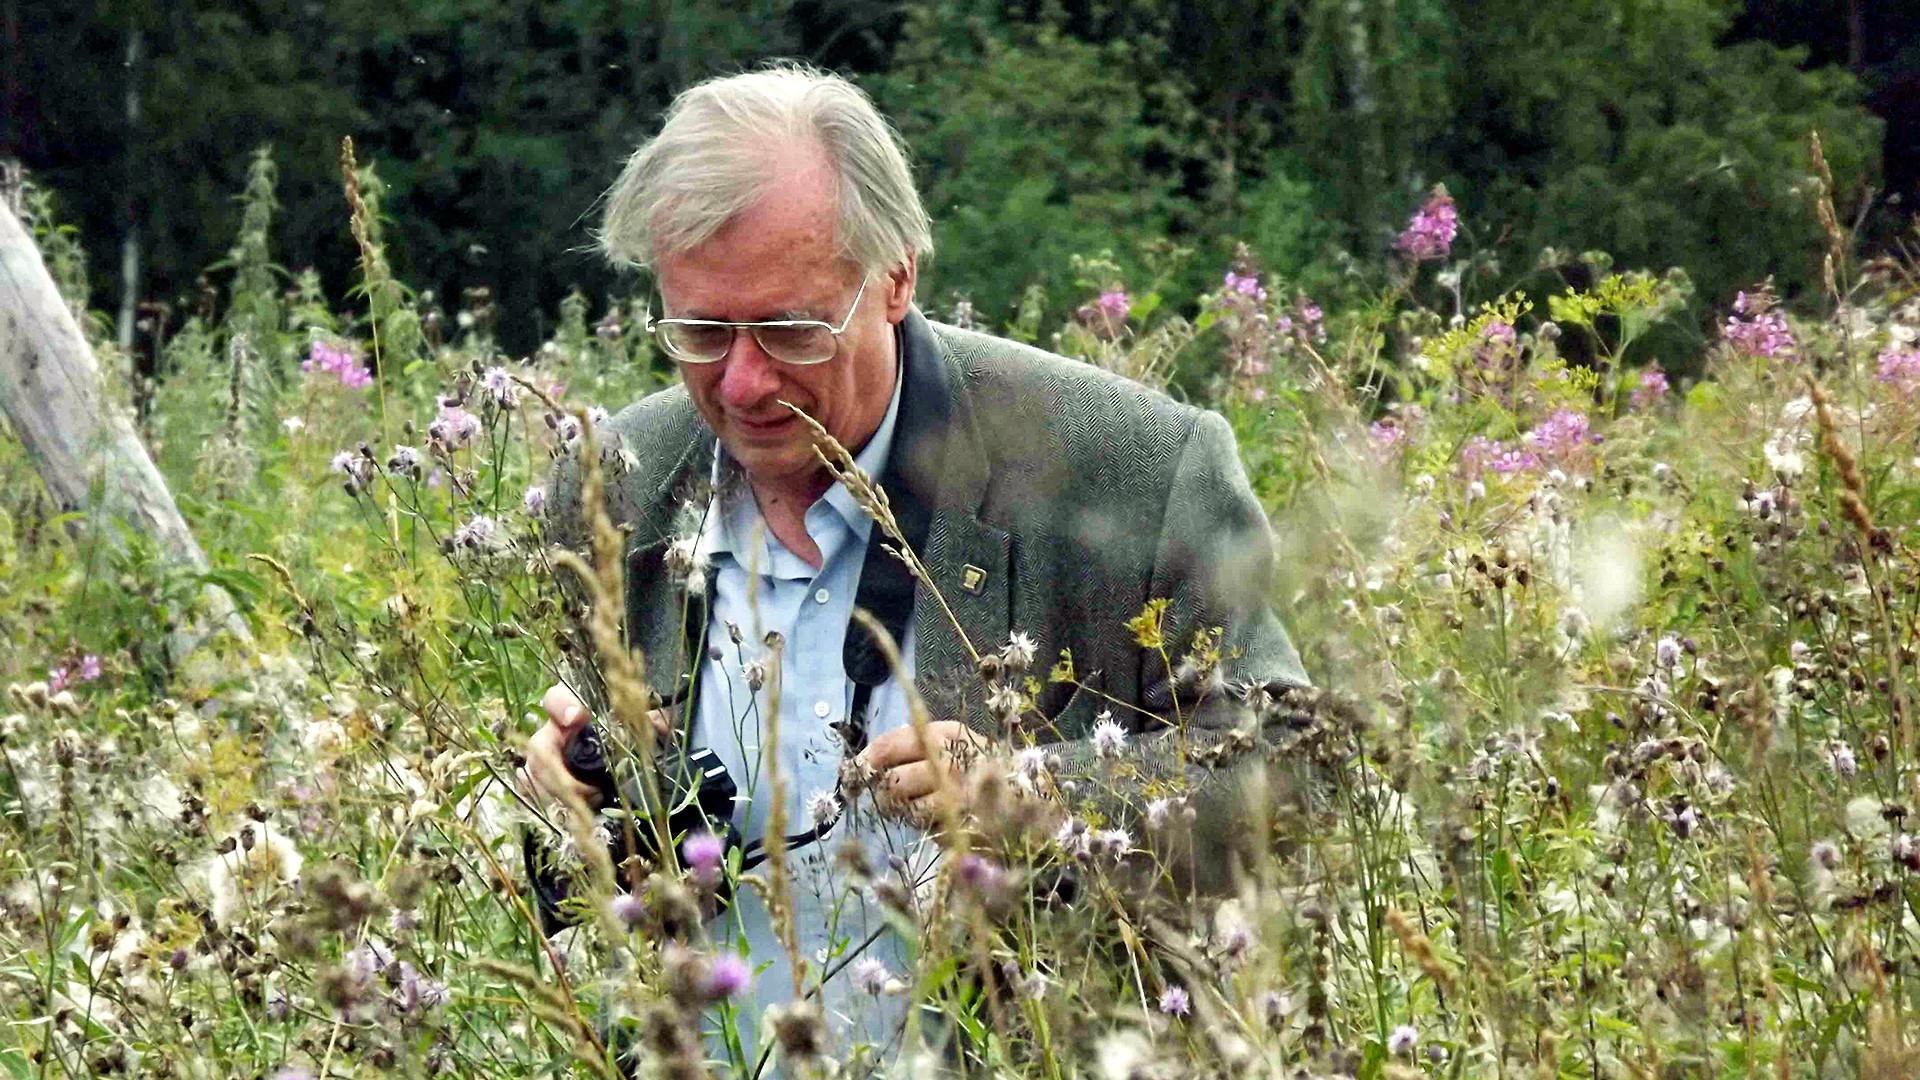 William Brumfield in the field near village of Predtecha, Totma Region (Vologda Province), August 2011